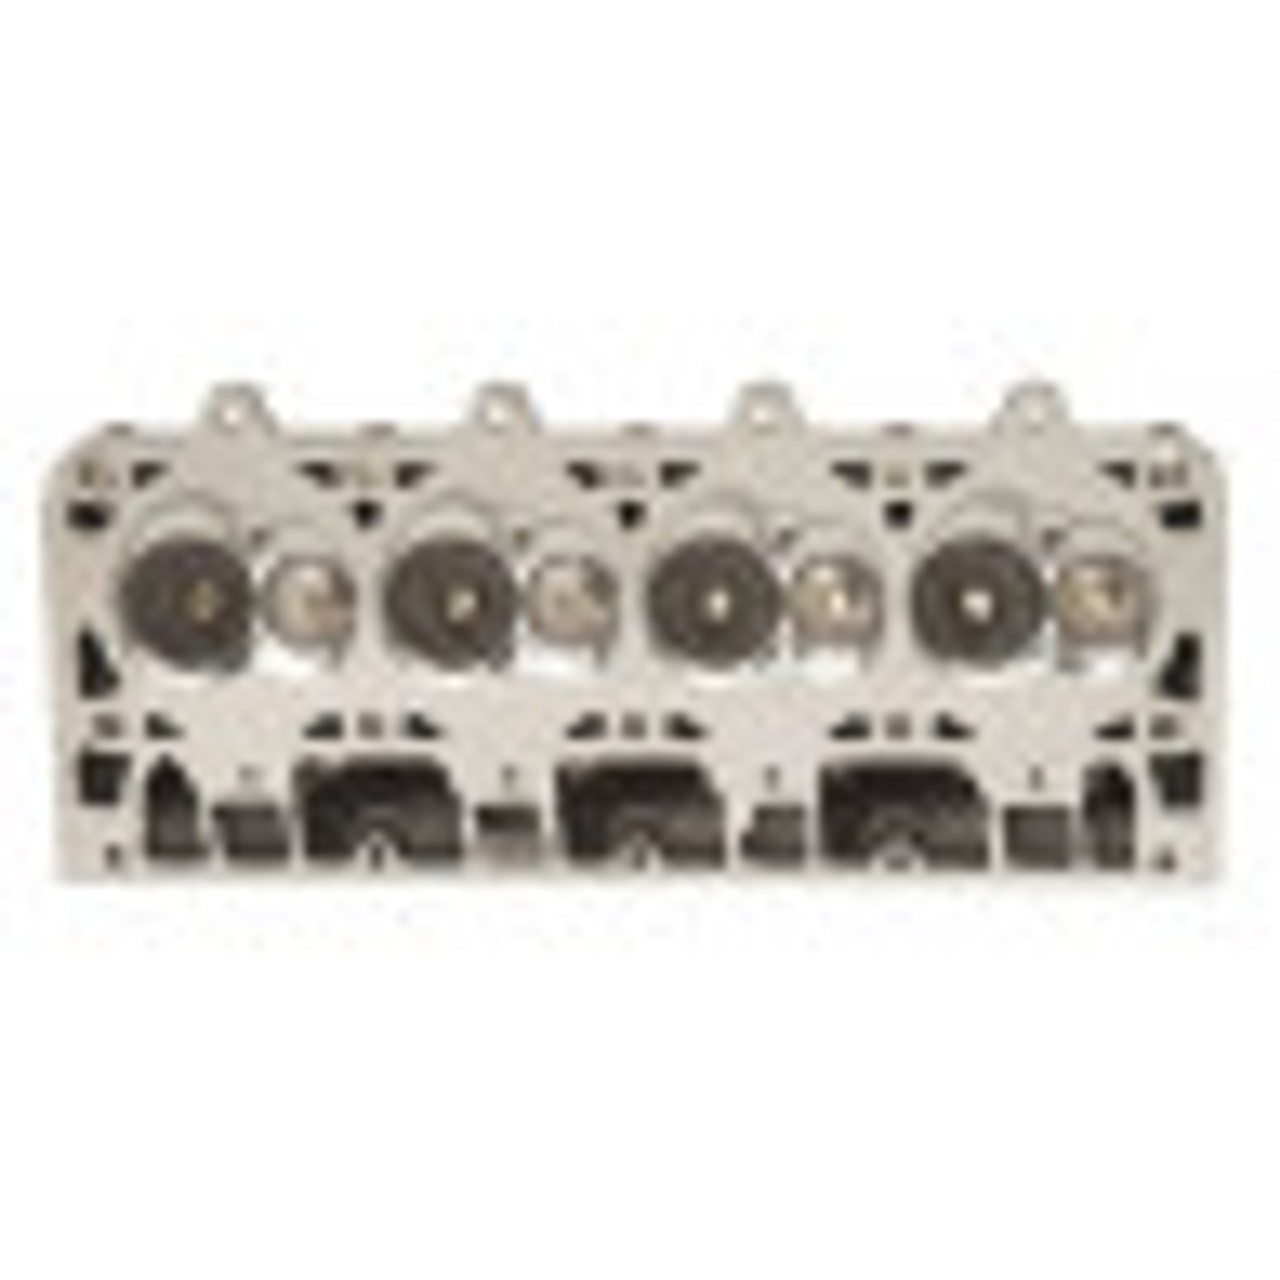 Brodix BP BR7 LS7 12 Degree CNC Ported Cylinder Heads   Assembled